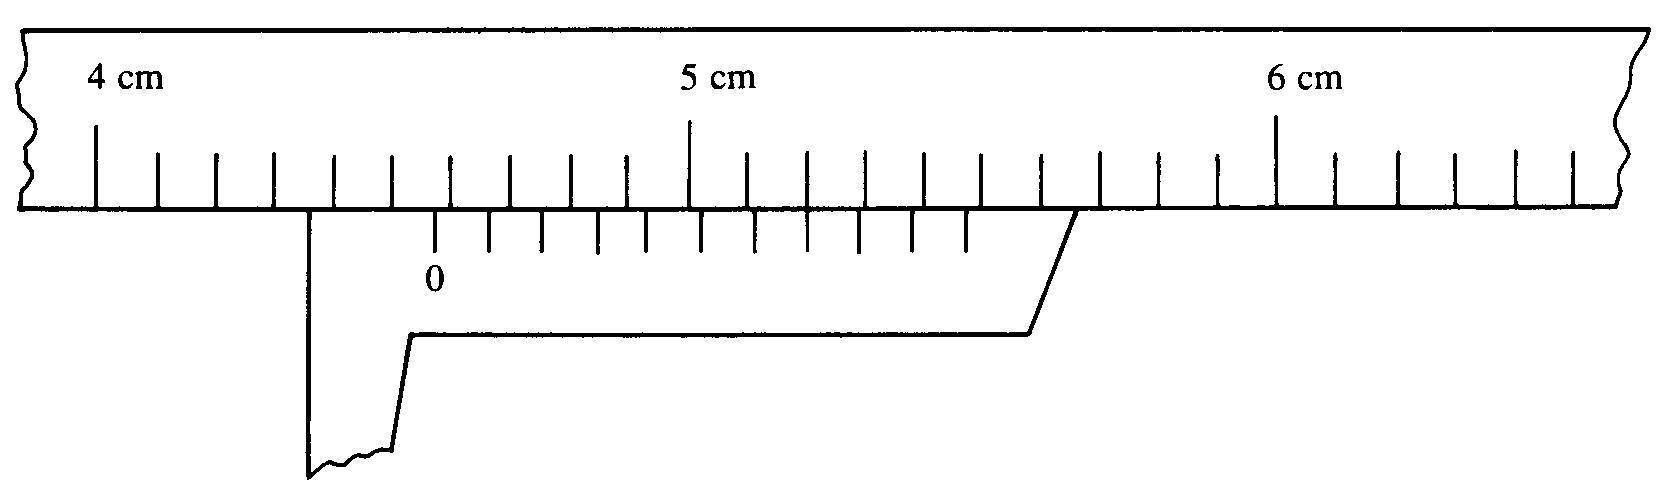 hight resolution of labeled diagram of vernier caliper